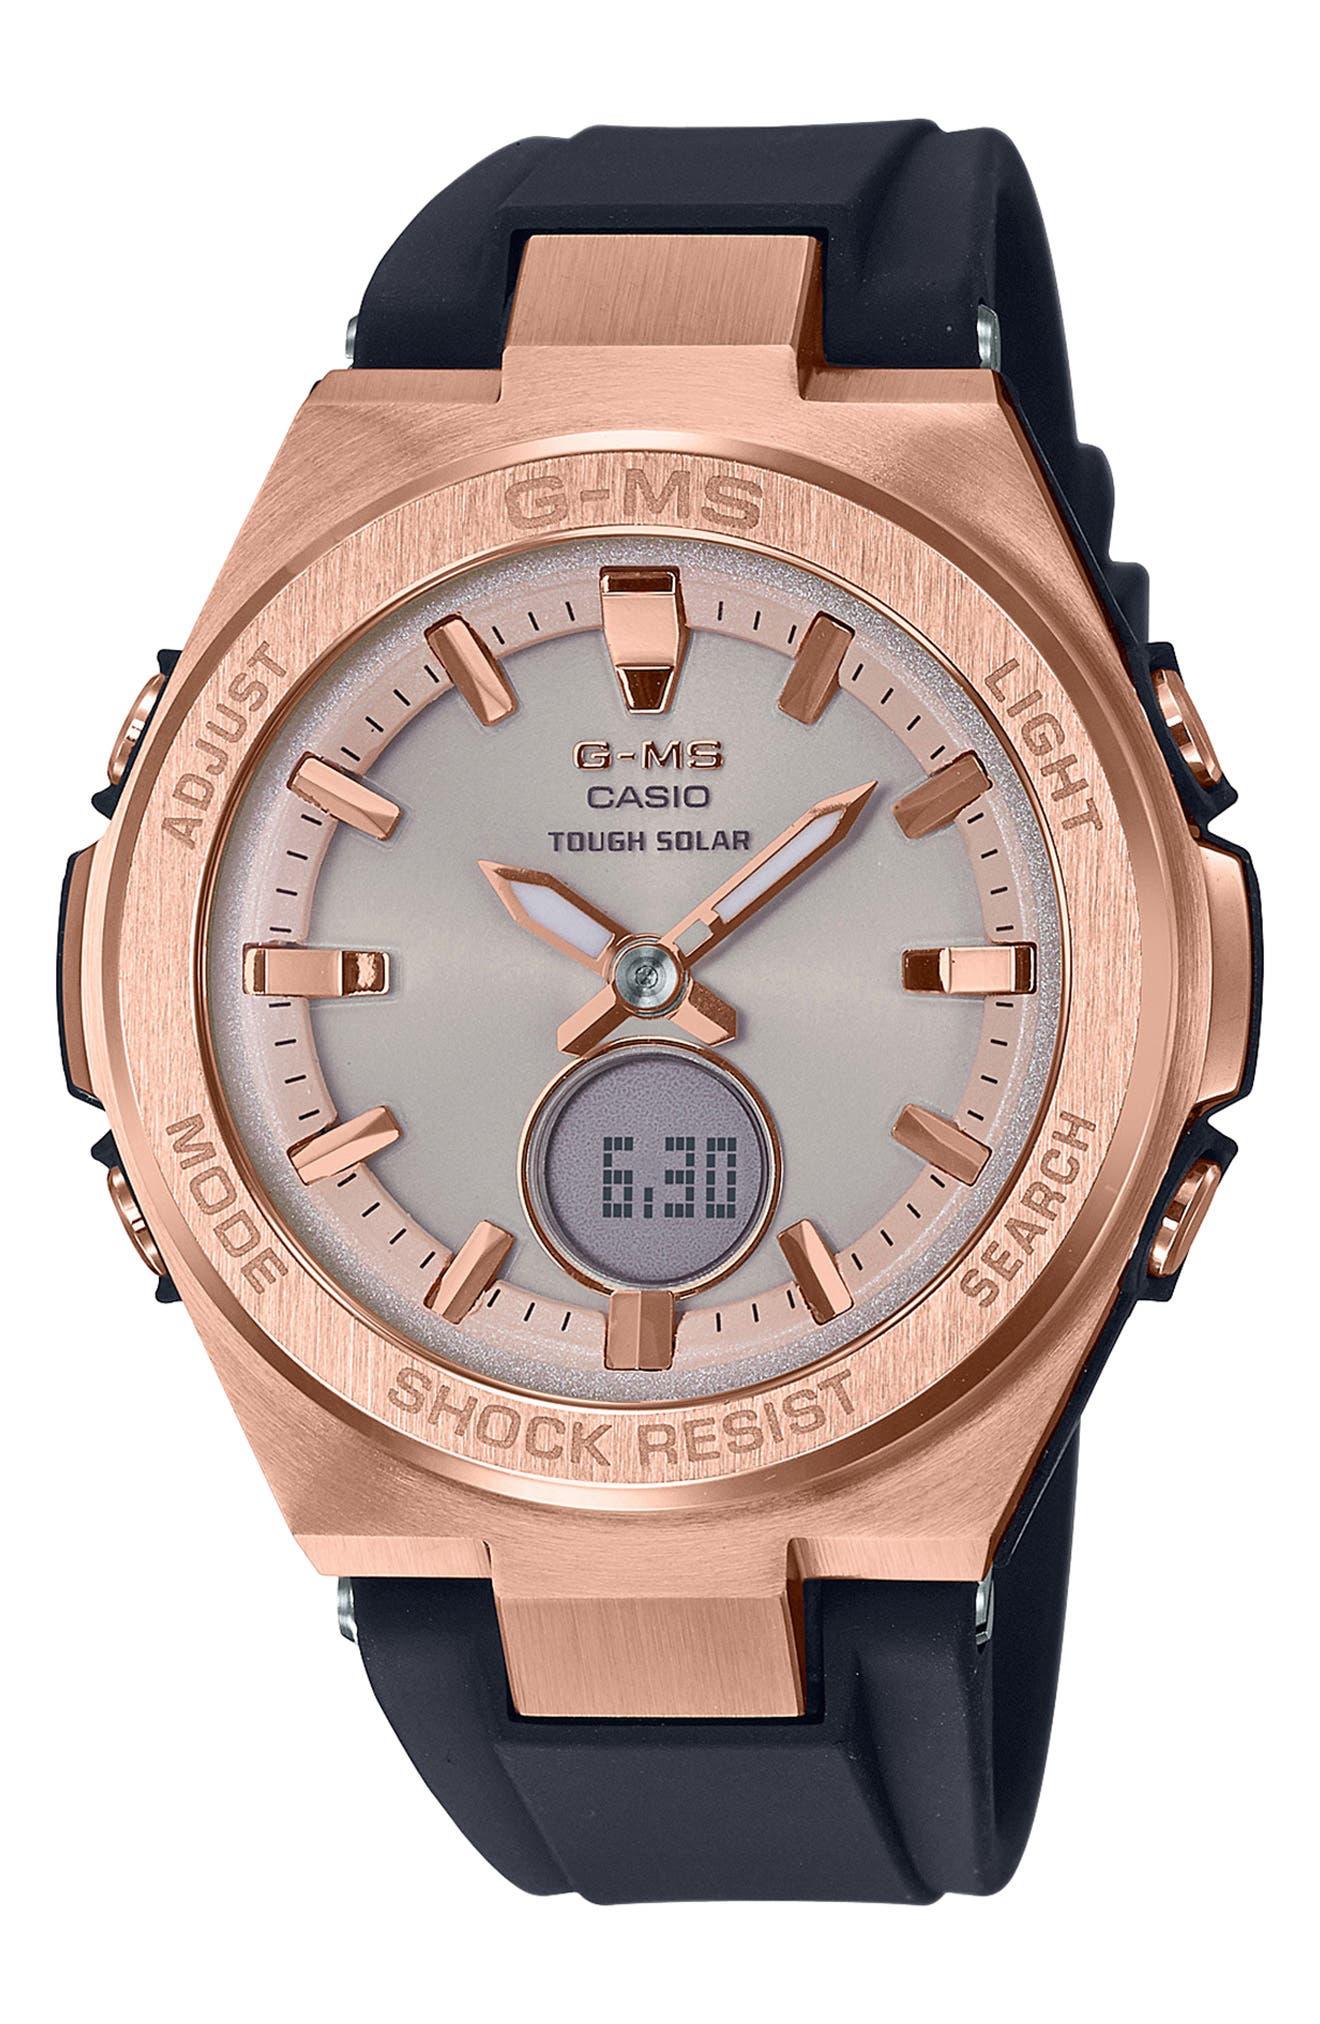 G-Shock G-MS Ana-Digi Resin Strap Watch, 38mm,                         Main,                         color, 001